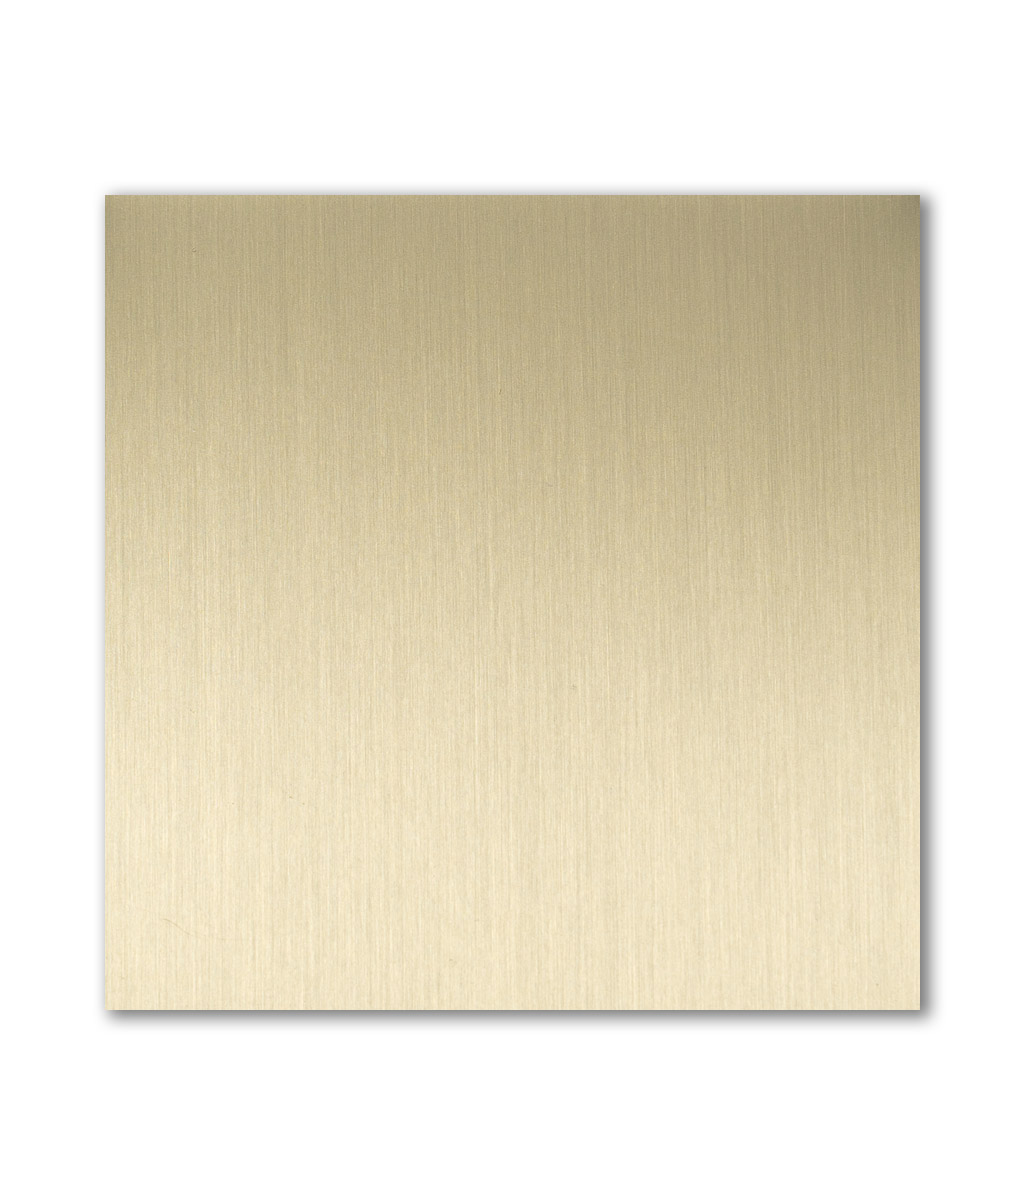 205 Gold sample